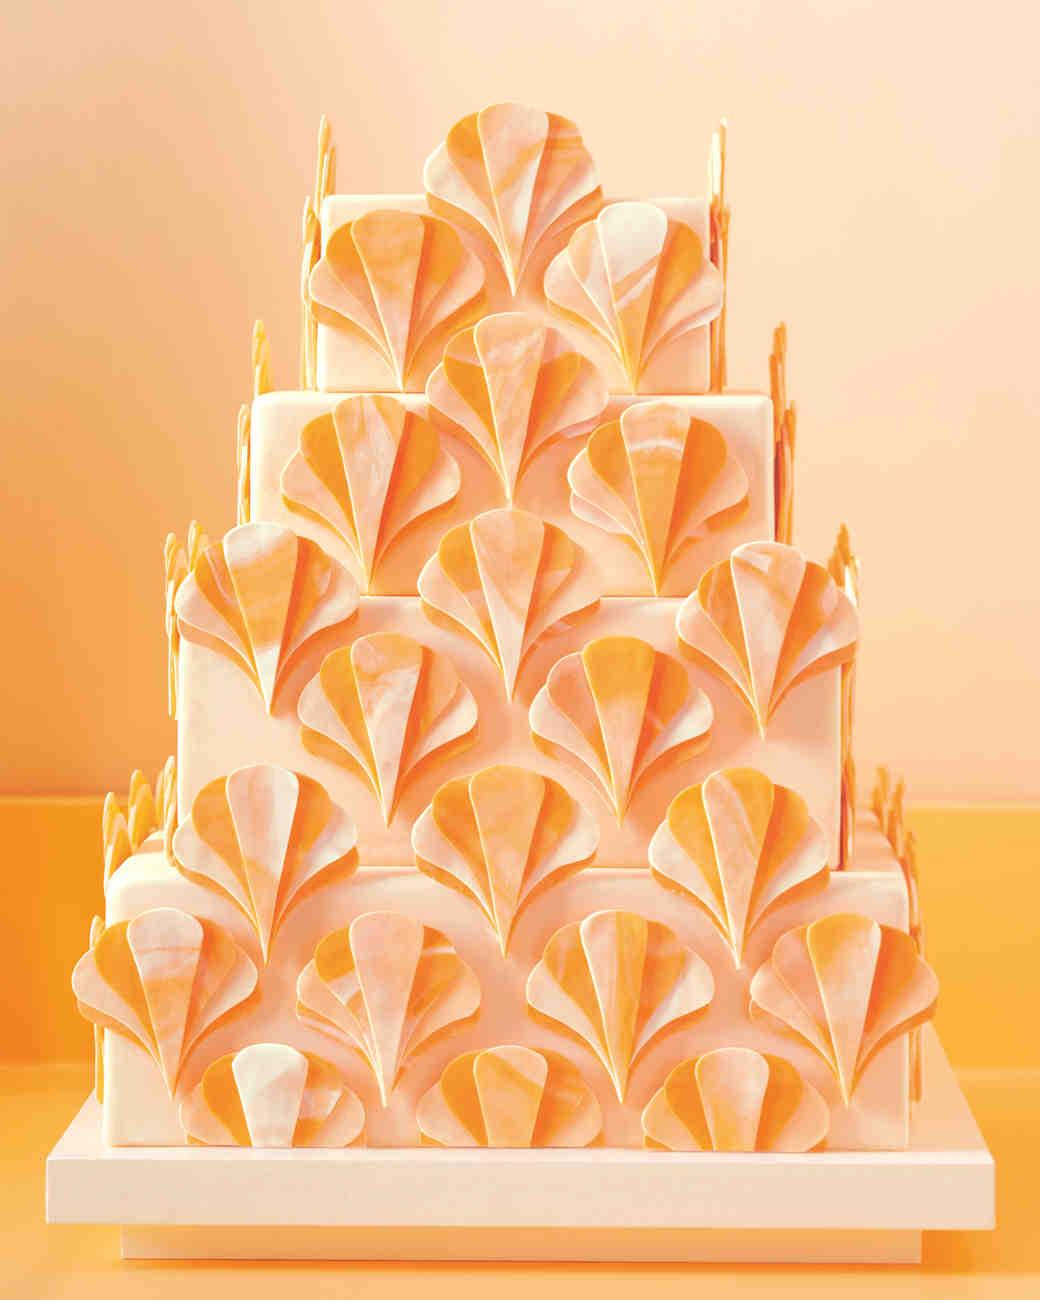 cakes-creamsicle-contempo-mwd108165.jpg